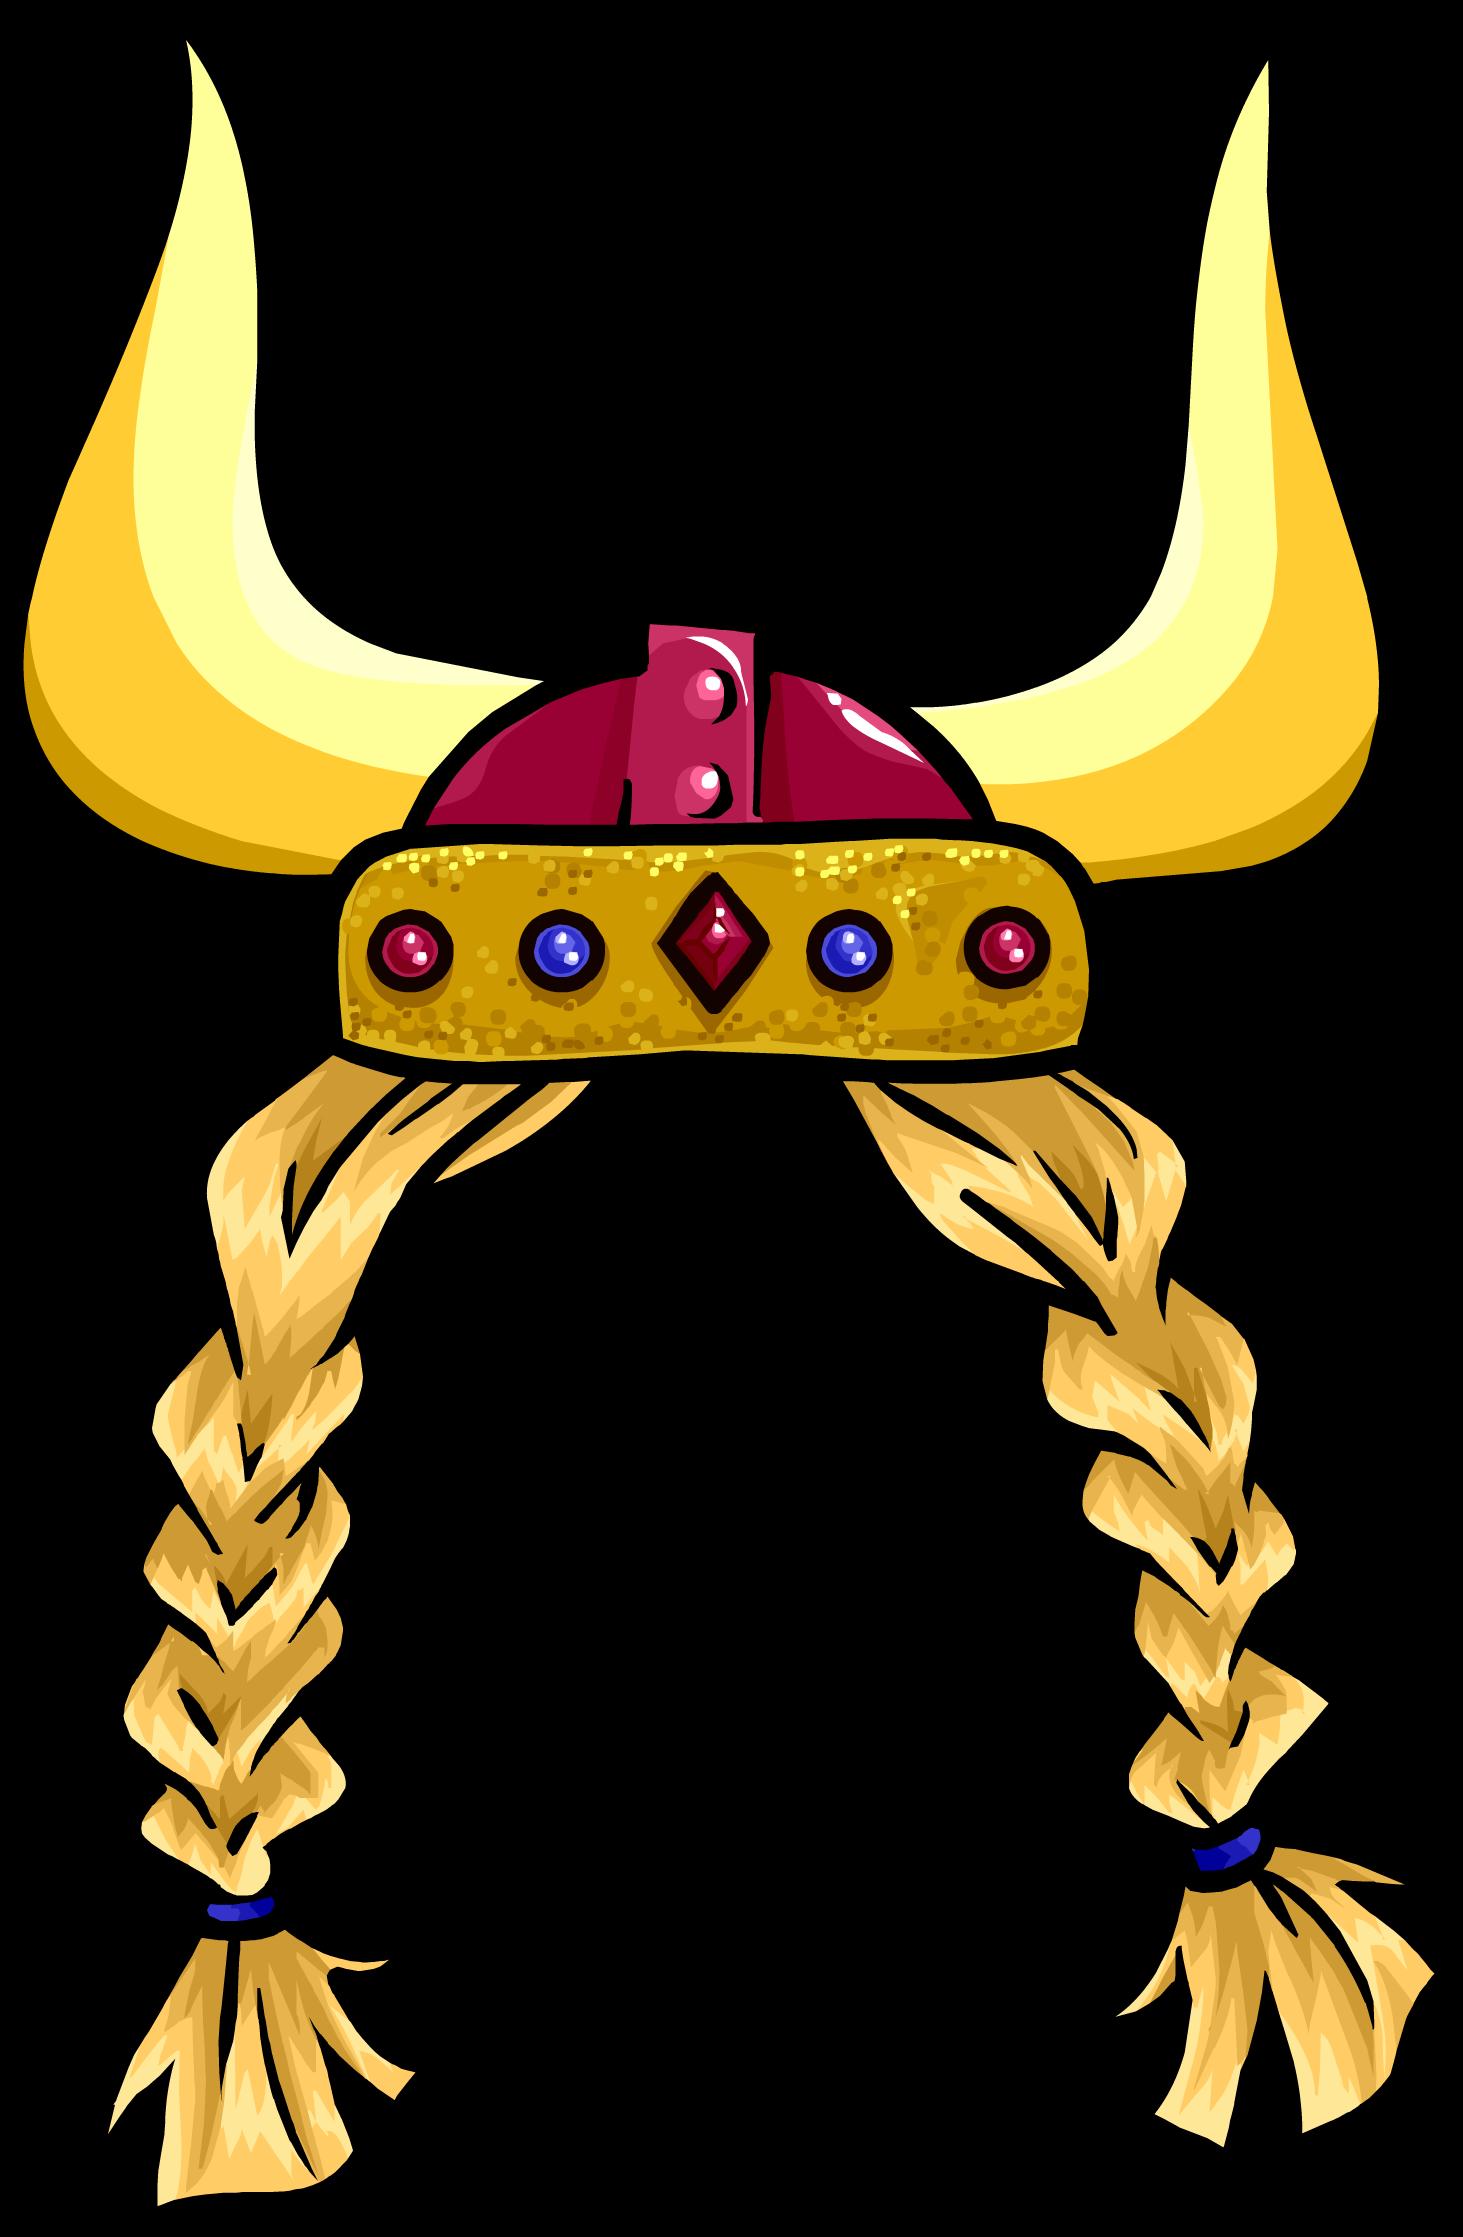 Image - Jewelled Viking Helmet.PNG | Club Penguin Wiki